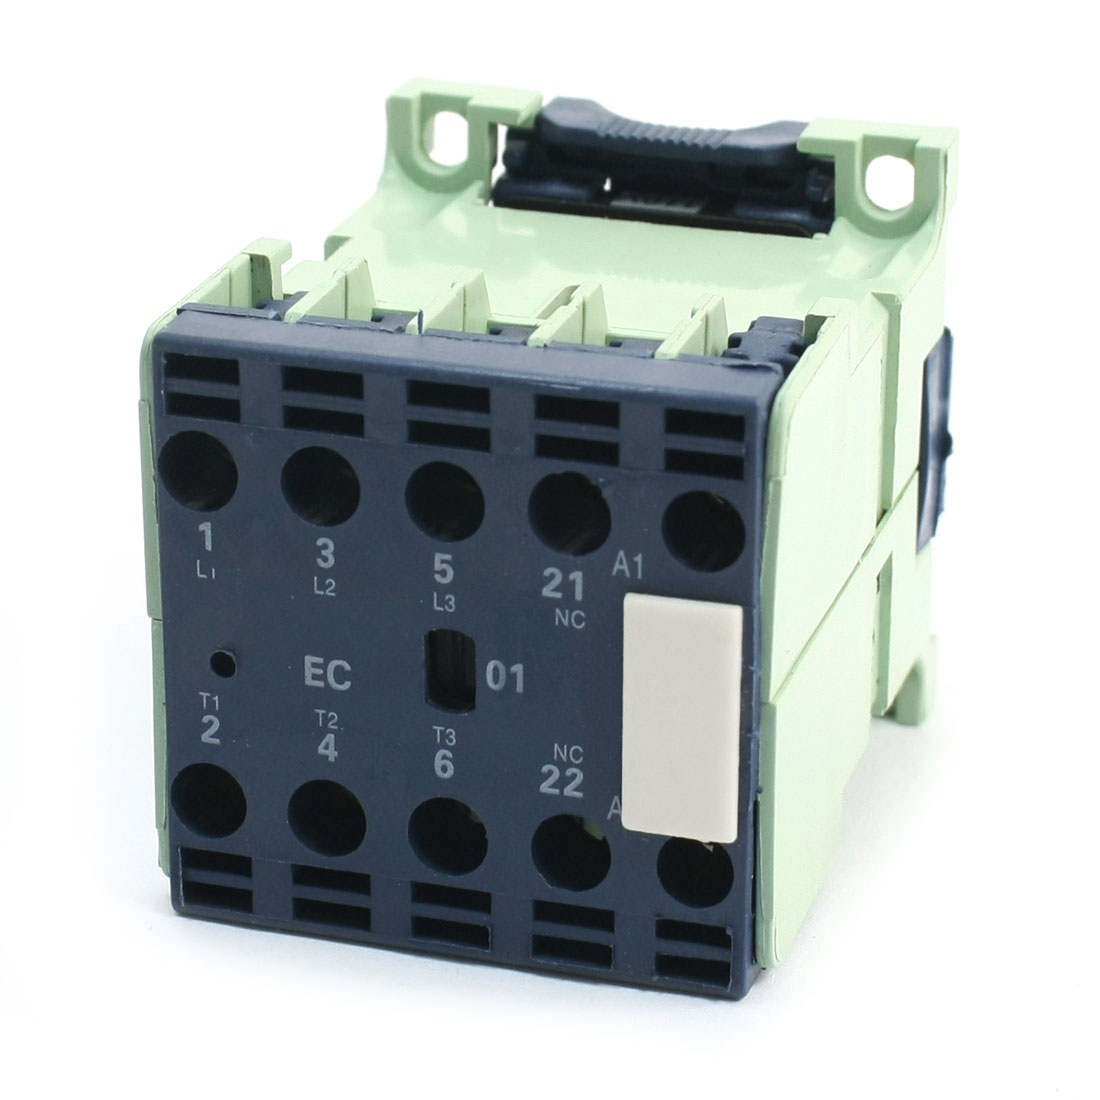 110V Coil Motor Controler AC Contactor 3P 3 Pole 1NC 6ACJX2-0601E